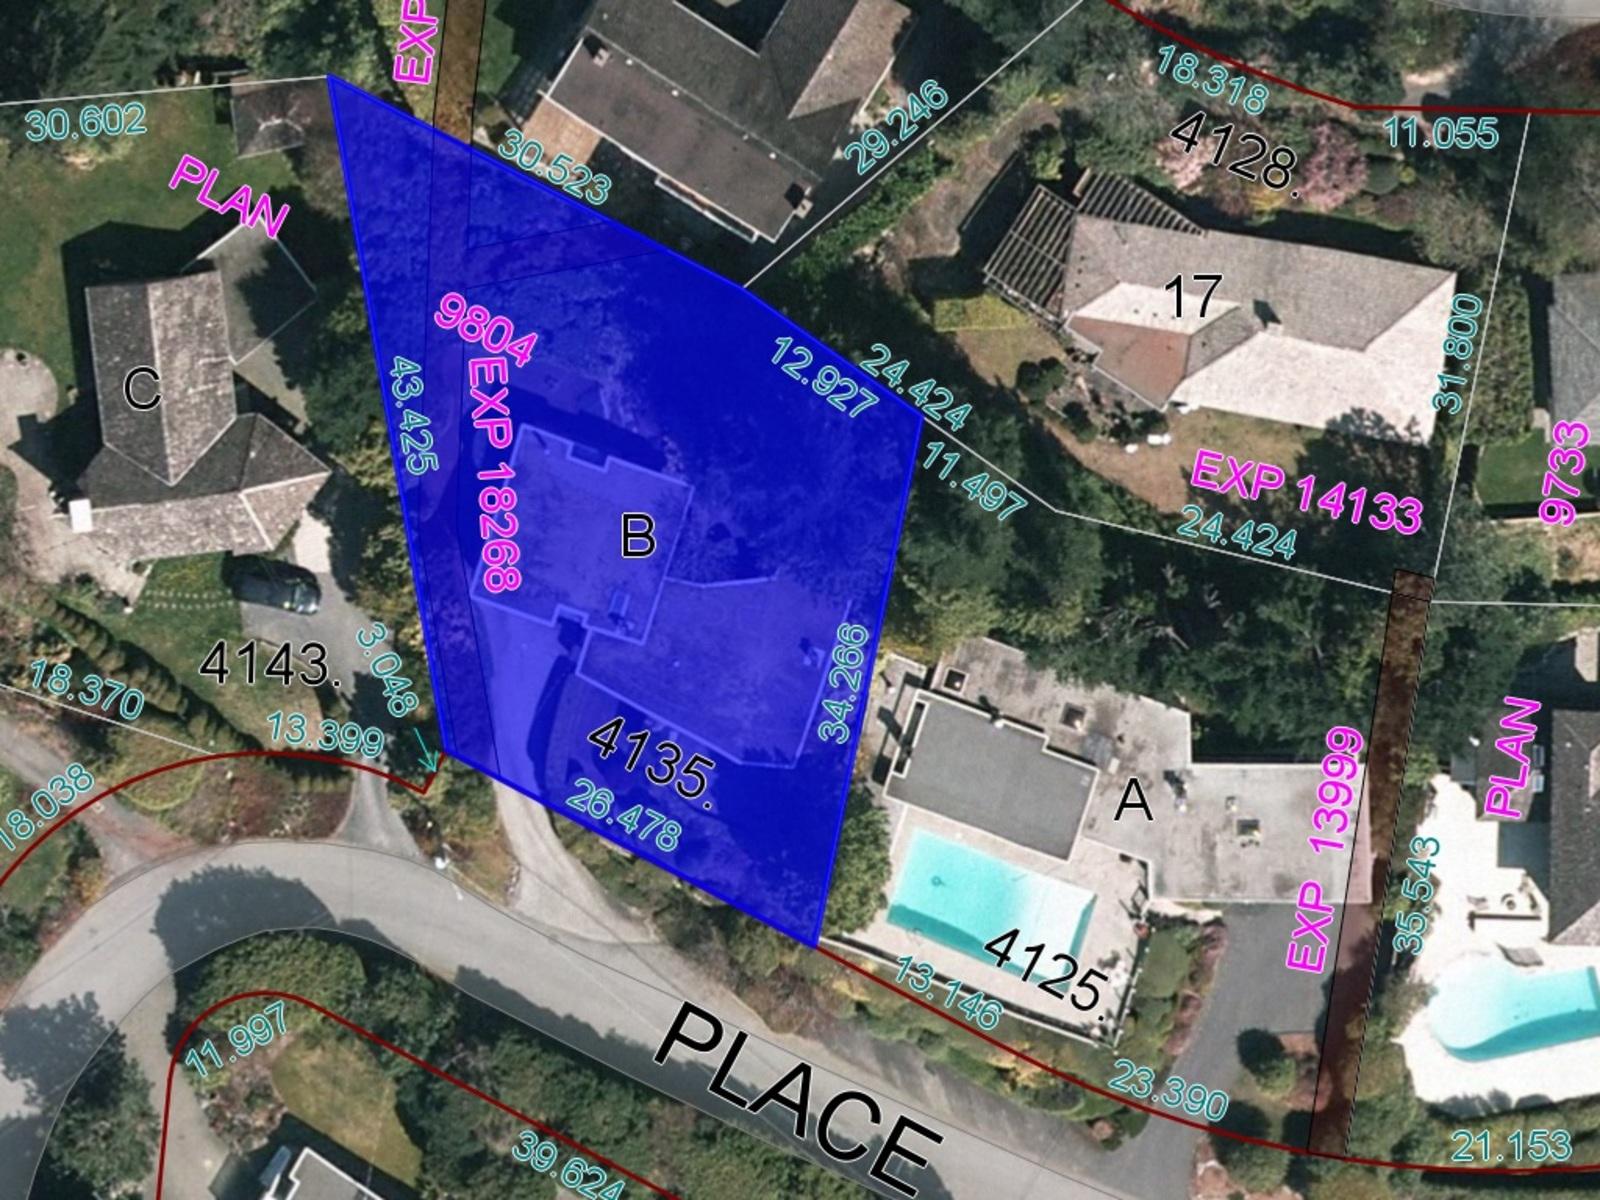 4135-Burkehill-Pl---GIS at 4135 Burkehll Place, Bayridge, West Vancouver